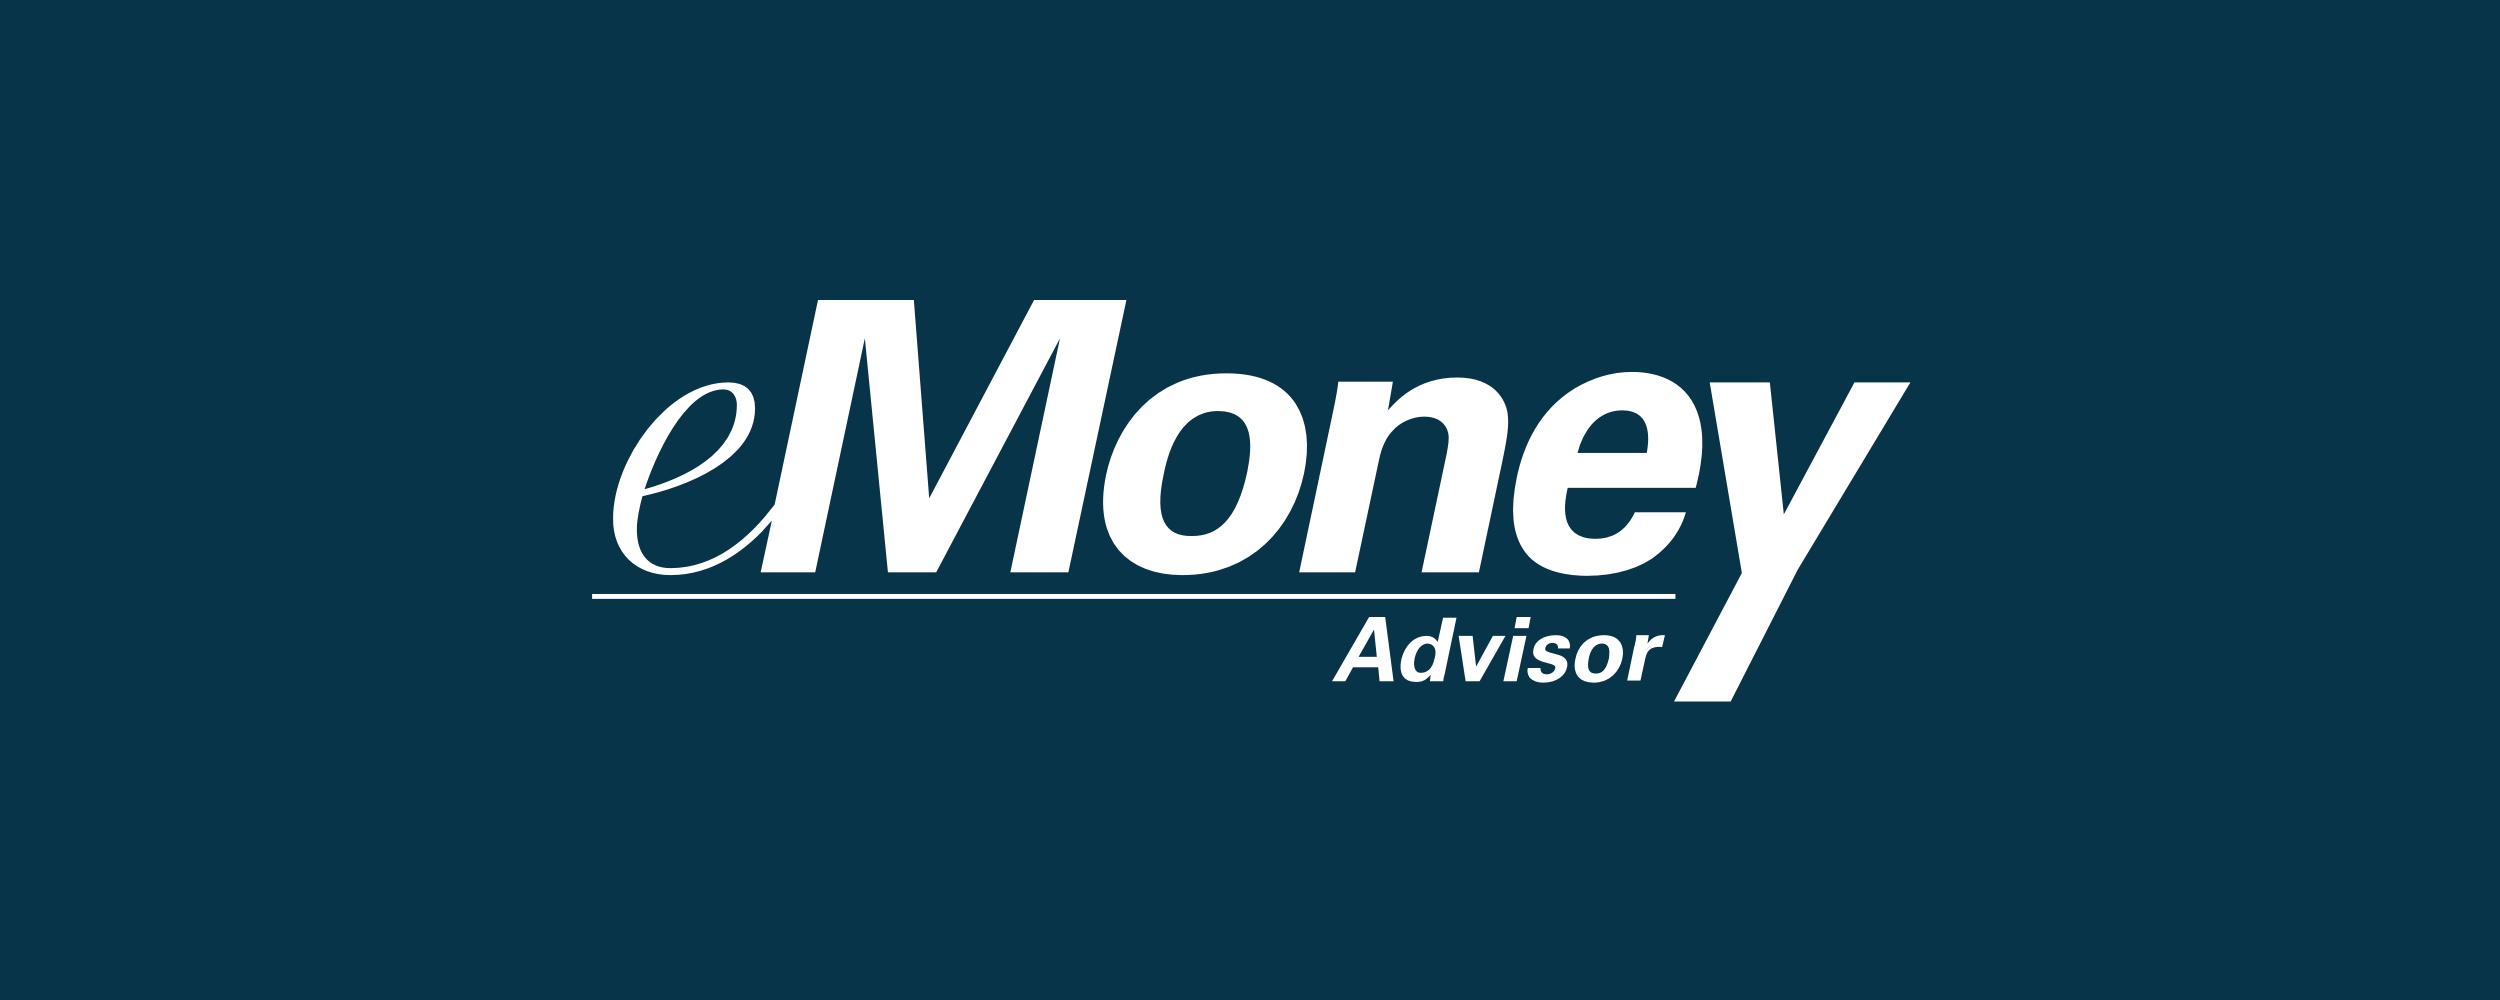 eMoney Dayton, OH Gudorf Financial Group, LLC